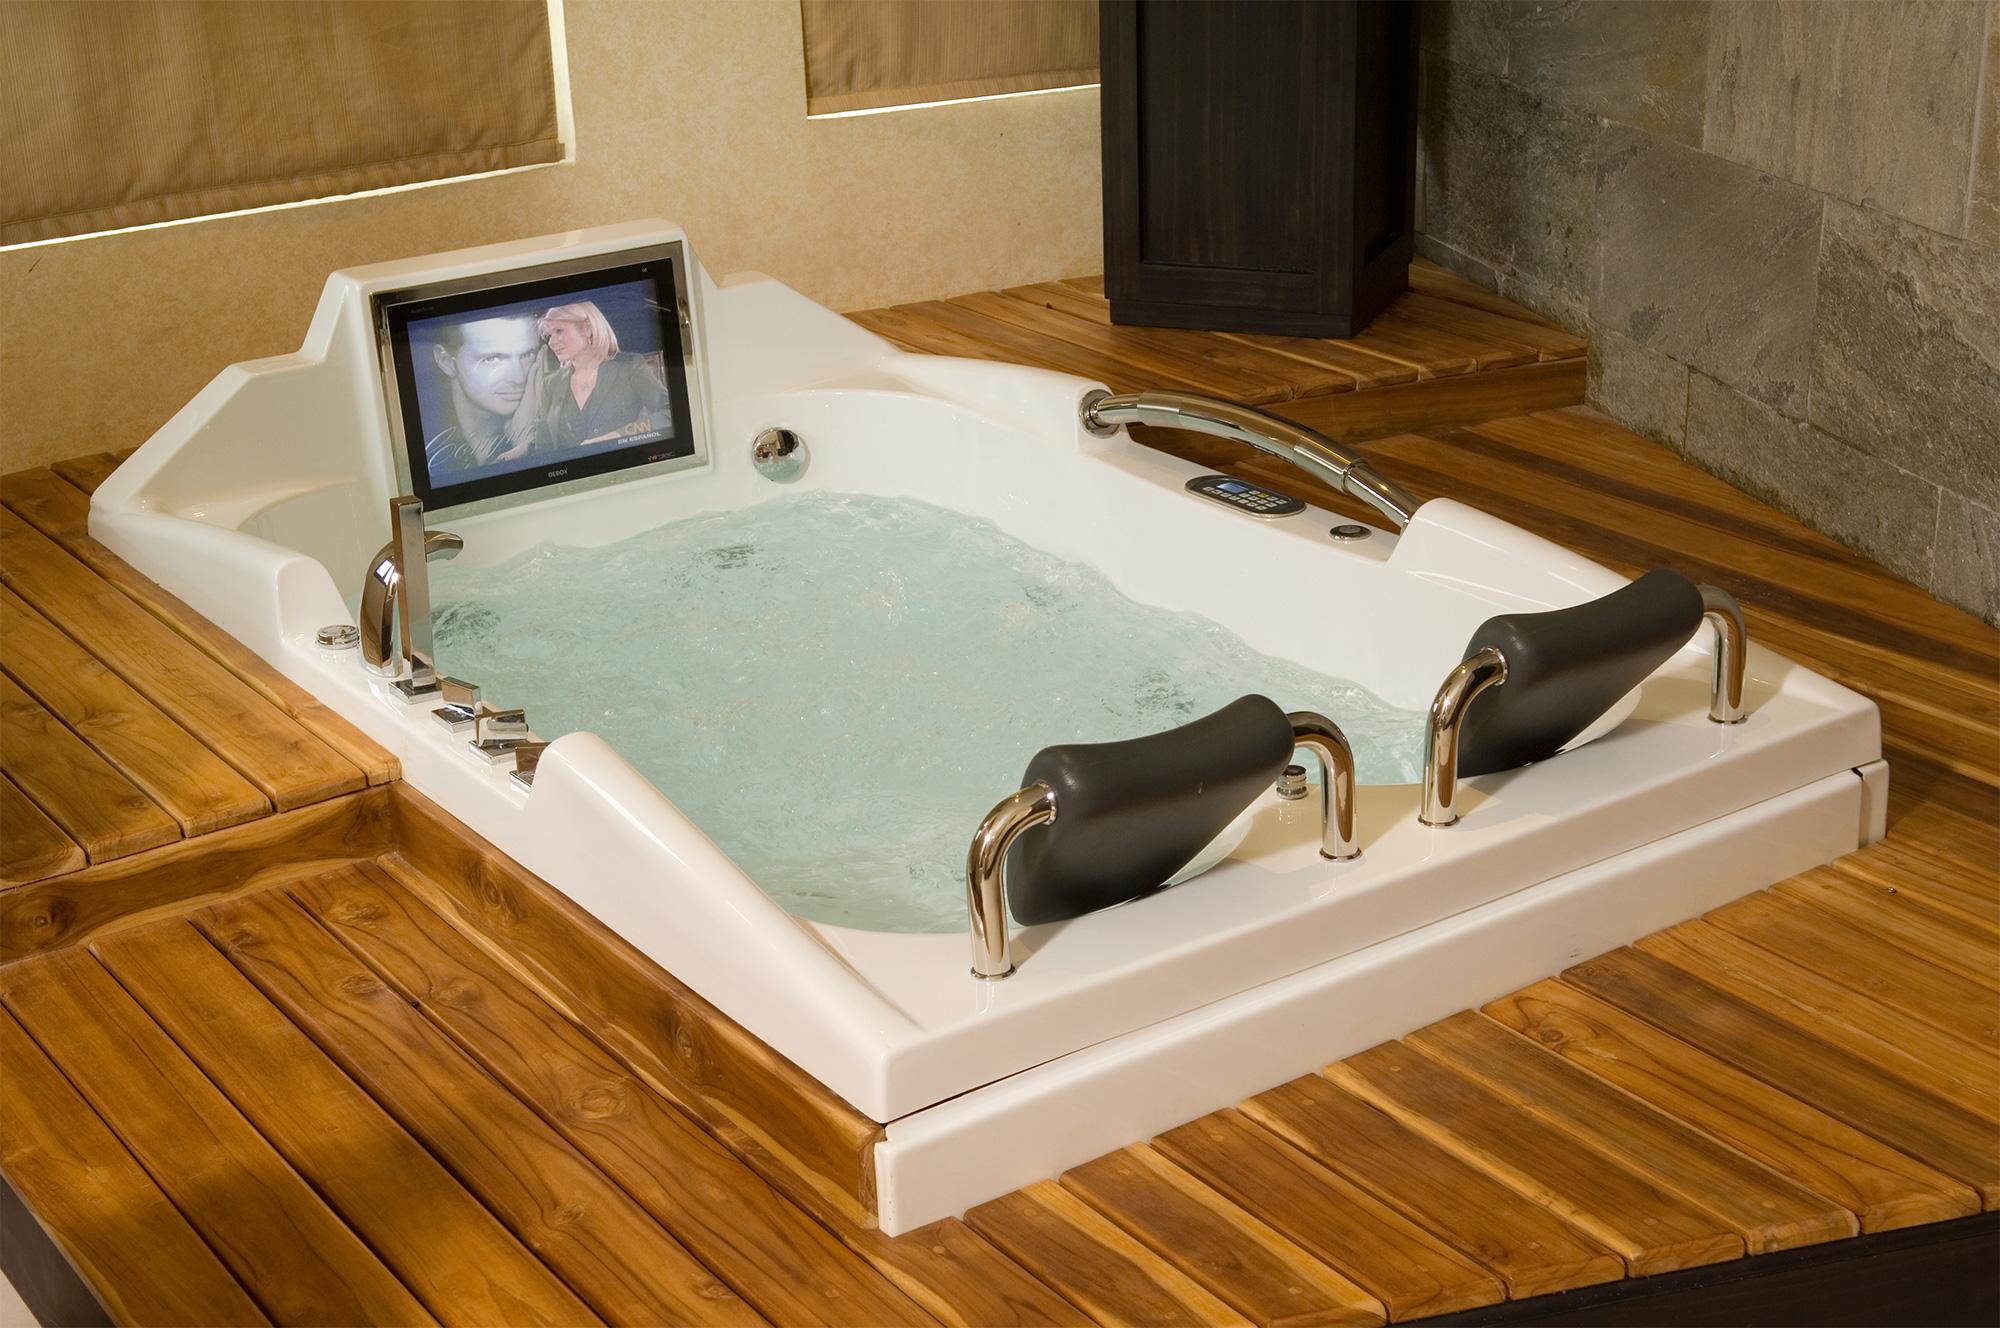 Magnificent Royal Jacuzzi Tub Images - The Best Bathroom Ideas ...